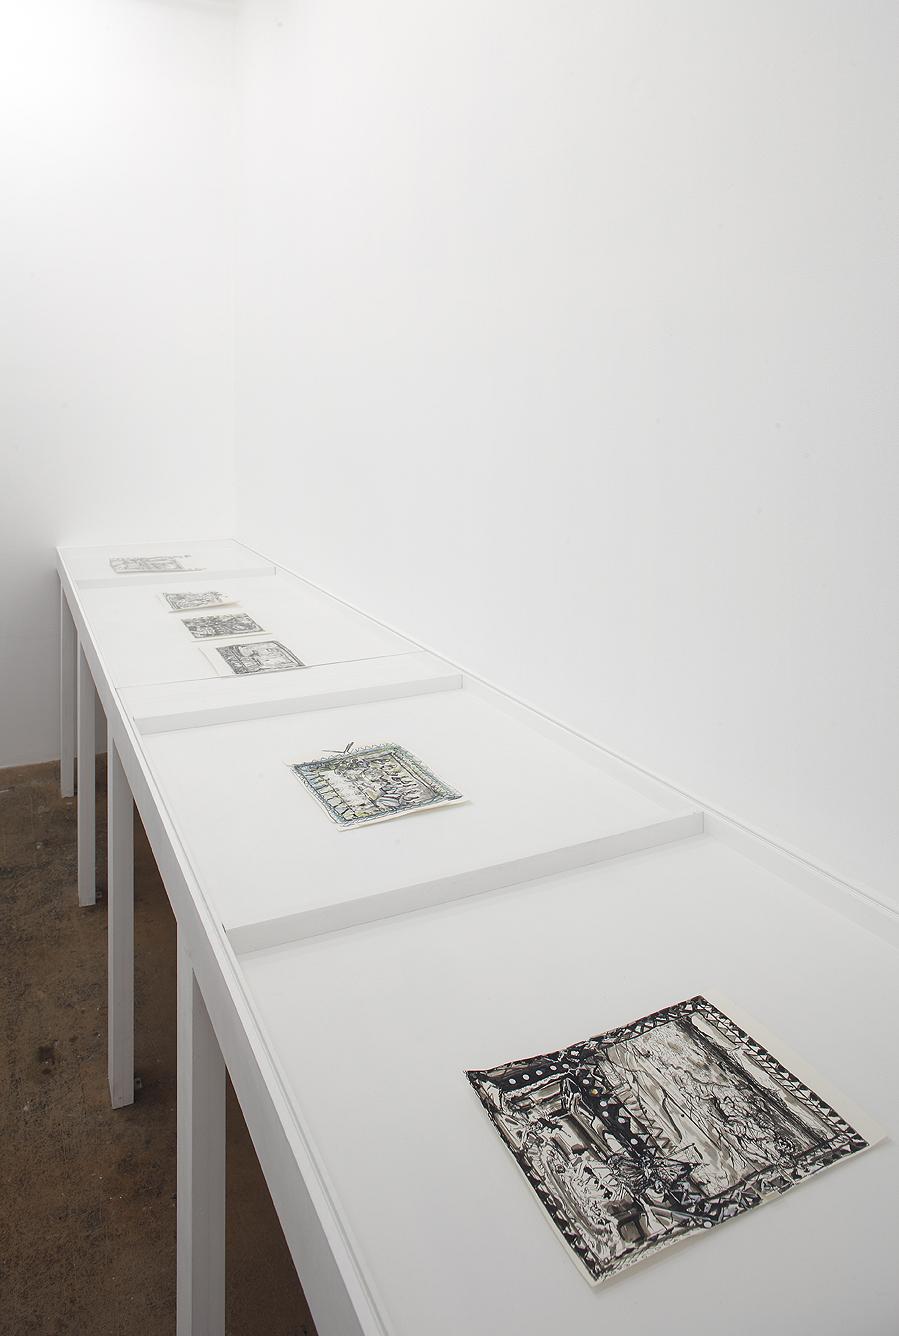 "Exhibition ""Y'a un truc qui masque l'horizon"", Jocelyn Wolff Gallery Paris, 23. March – 30. April 2010"